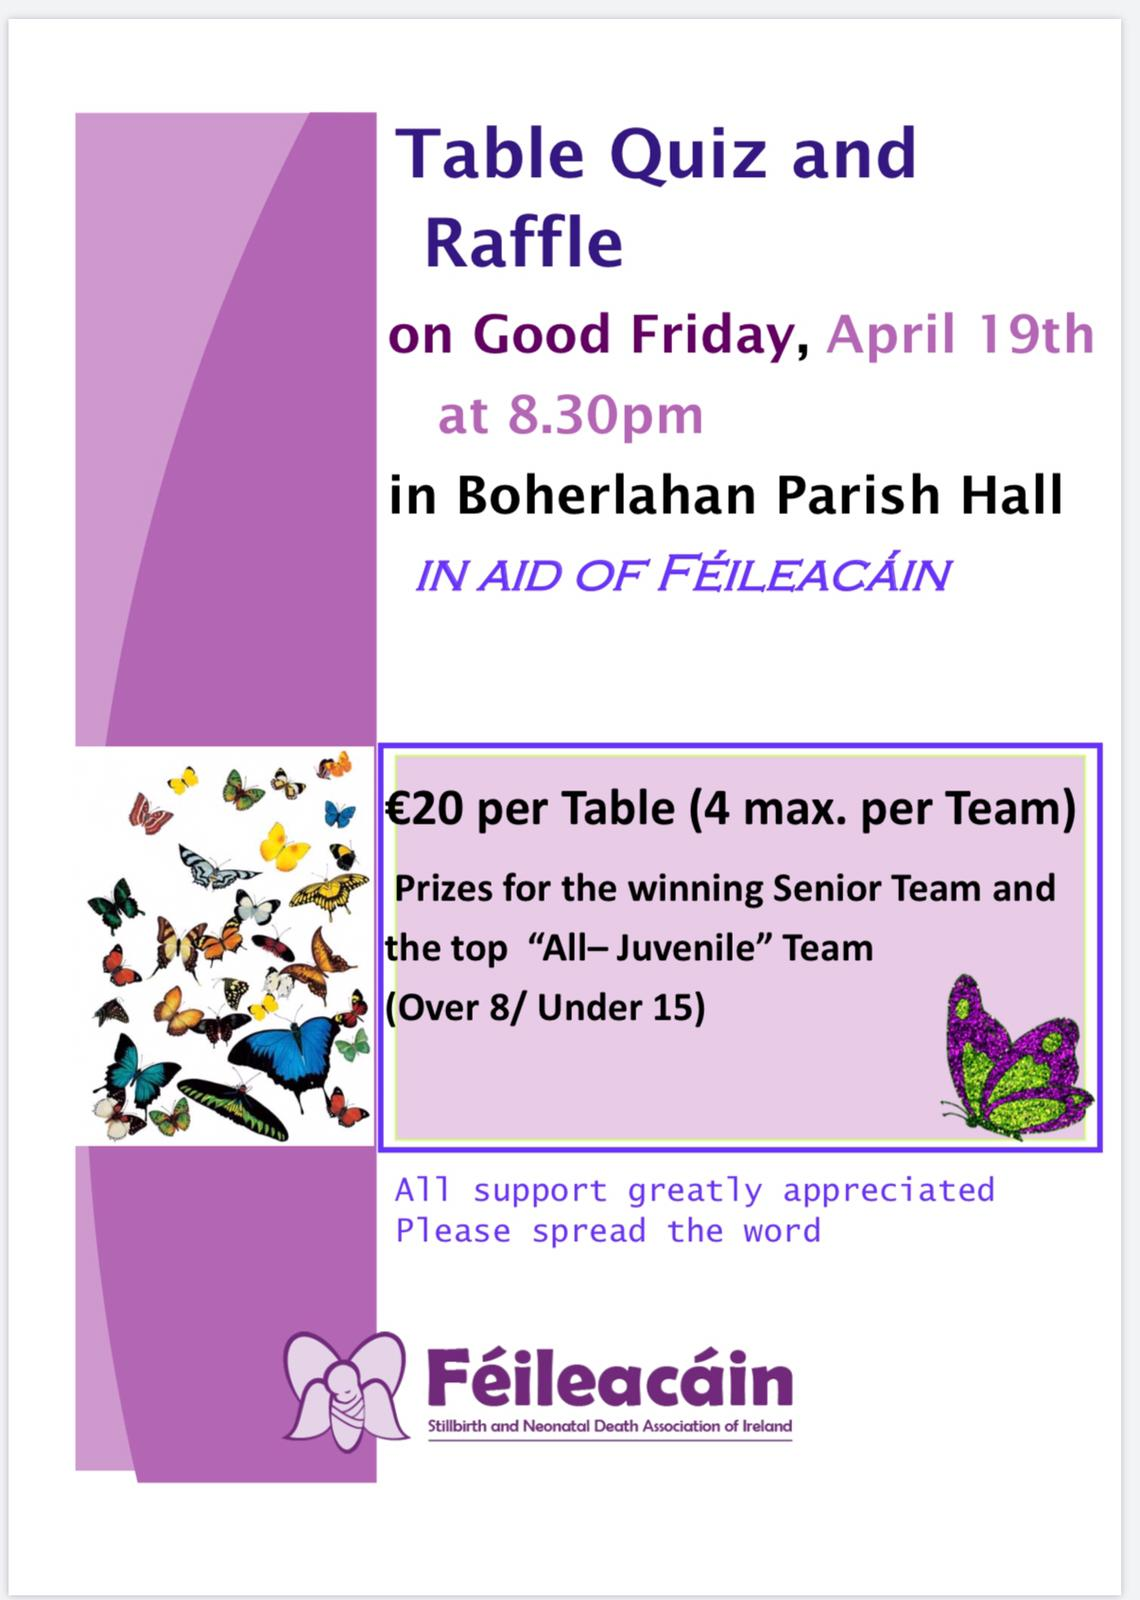 Table Quiz and Raffle in Boherlahan on Good Friday.